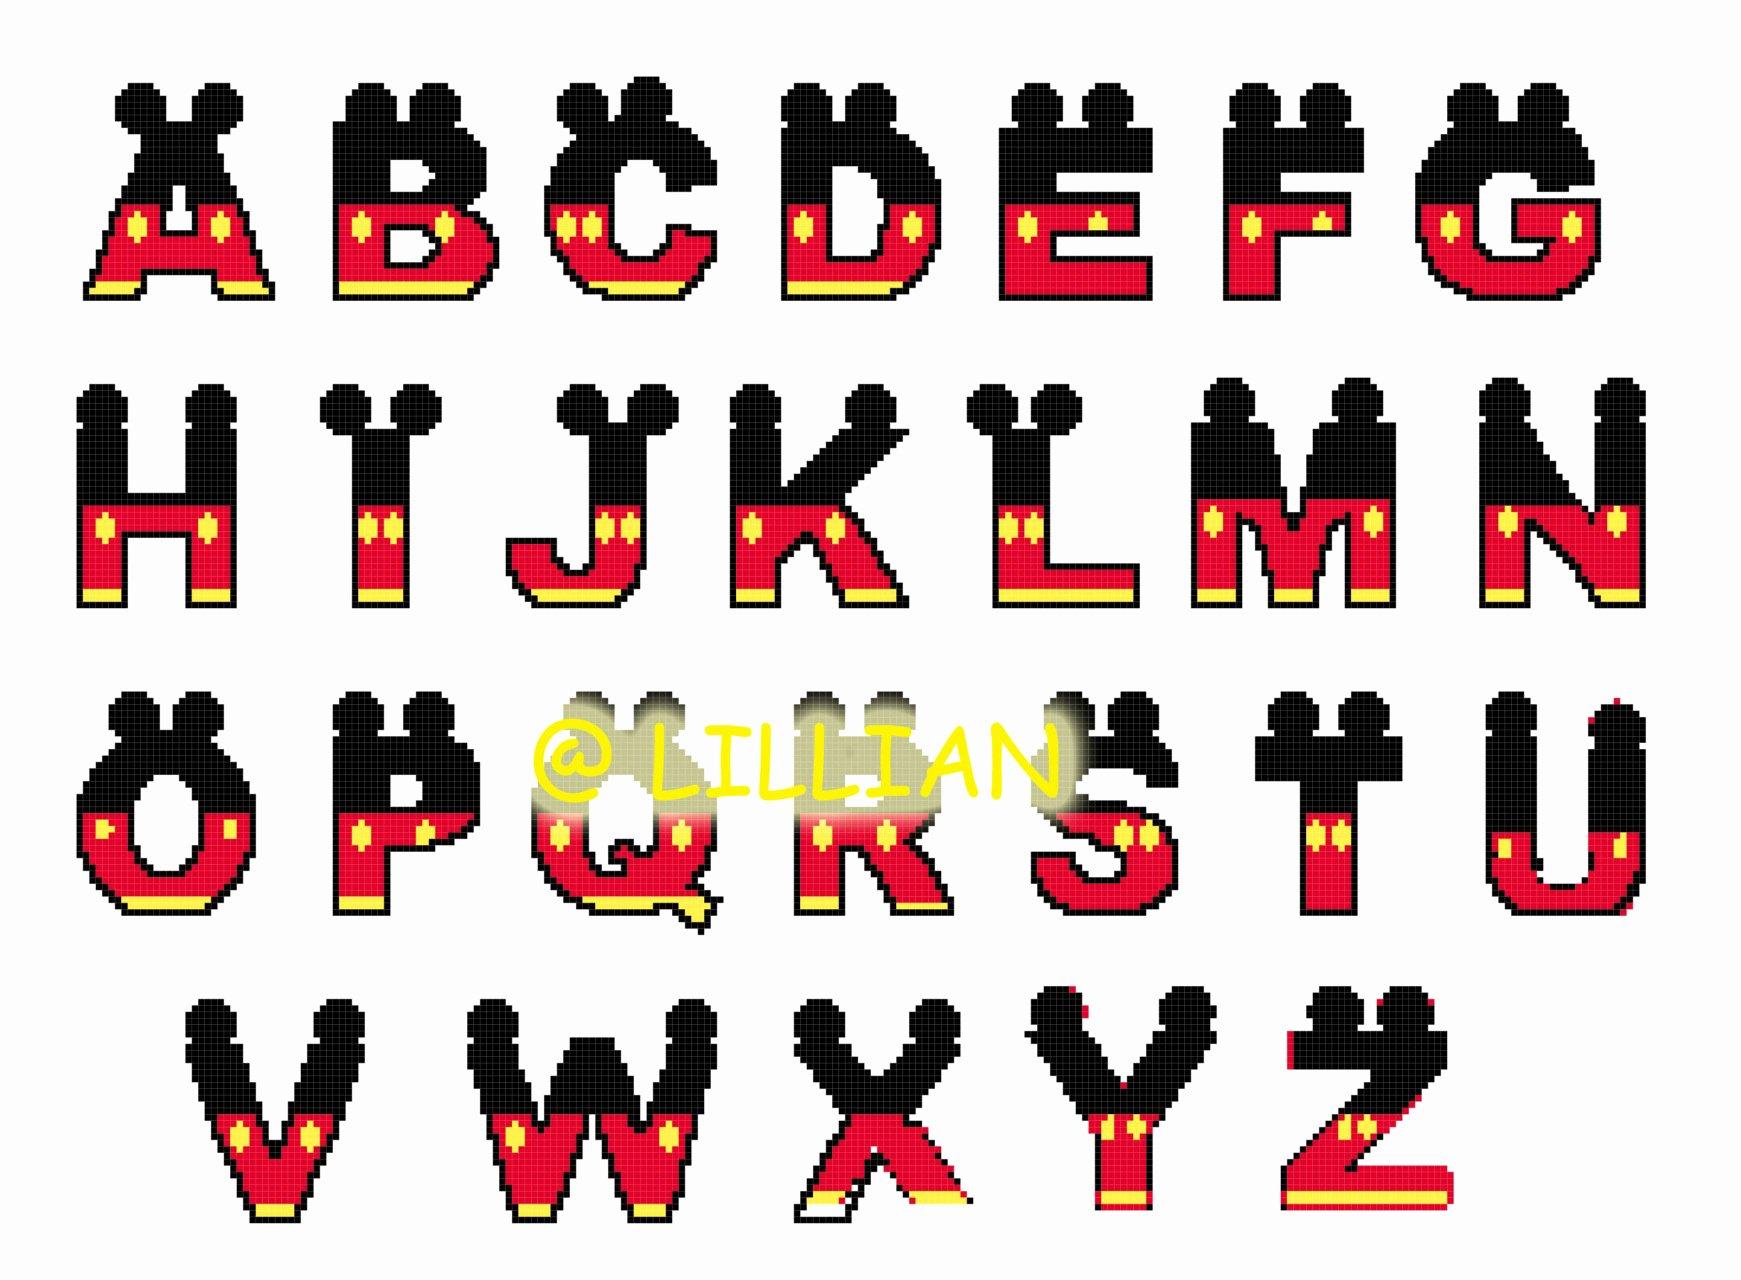 Mickey Mouse Alphabet Letters Inspirational Alphabet Abc Number 123 Cross Stitch Patterns Kits